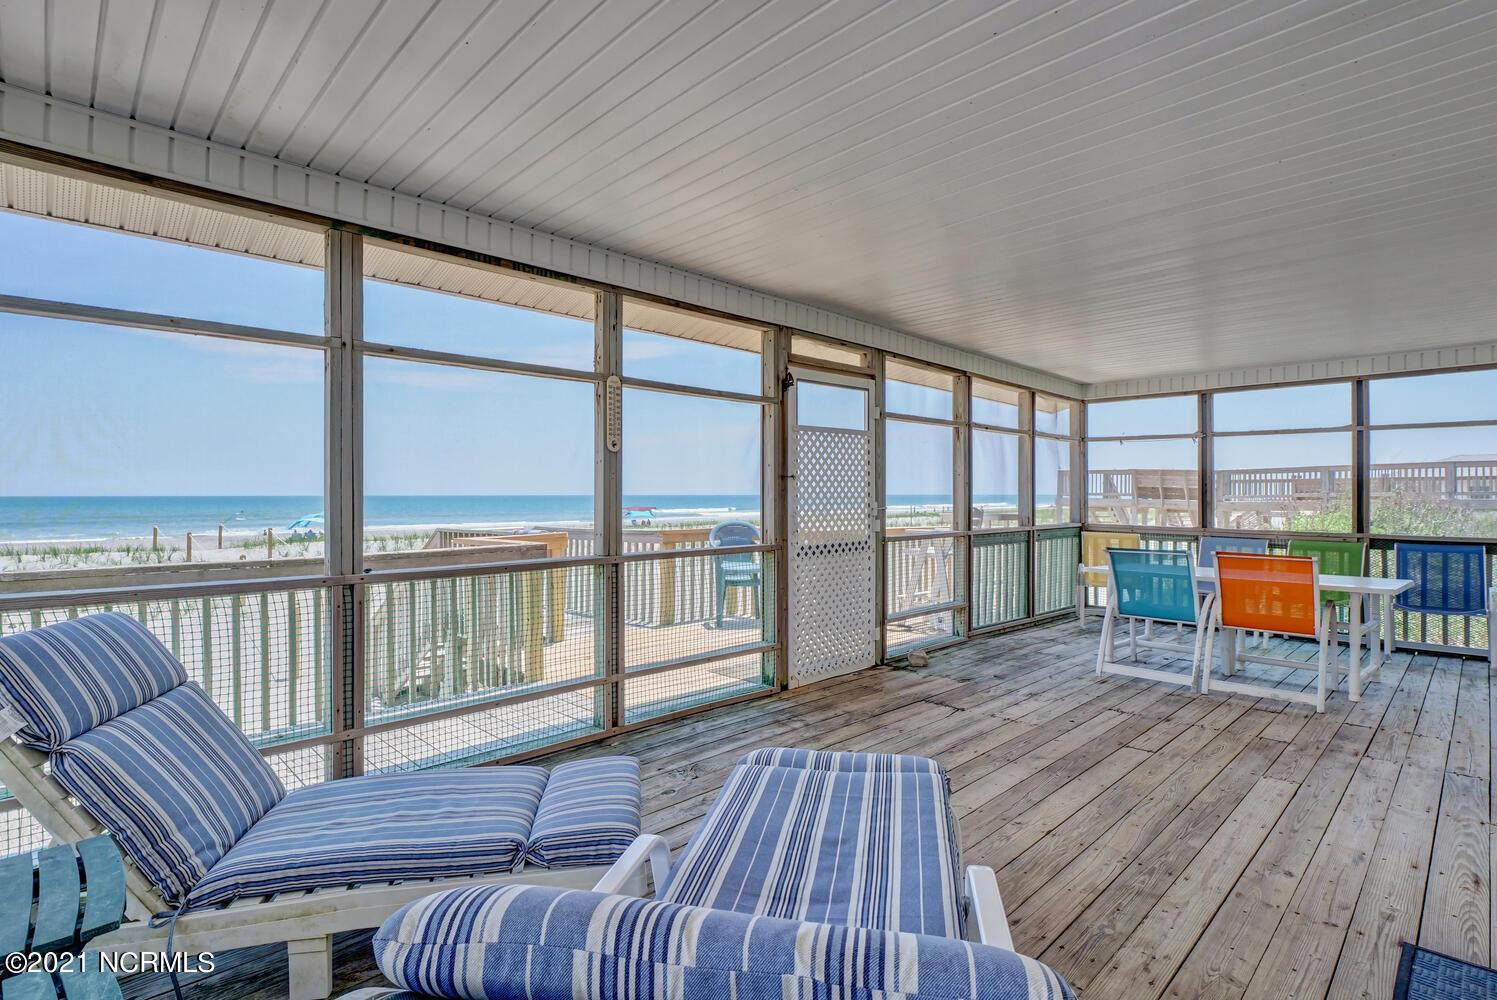 1413 Ocean Boulevard, Topsail Beach, North Carolina 28445, 3 Bedrooms Bedrooms, 6 Rooms Rooms,2 BathroomsBathrooms,Single family residence,For sale,Ocean,100273414